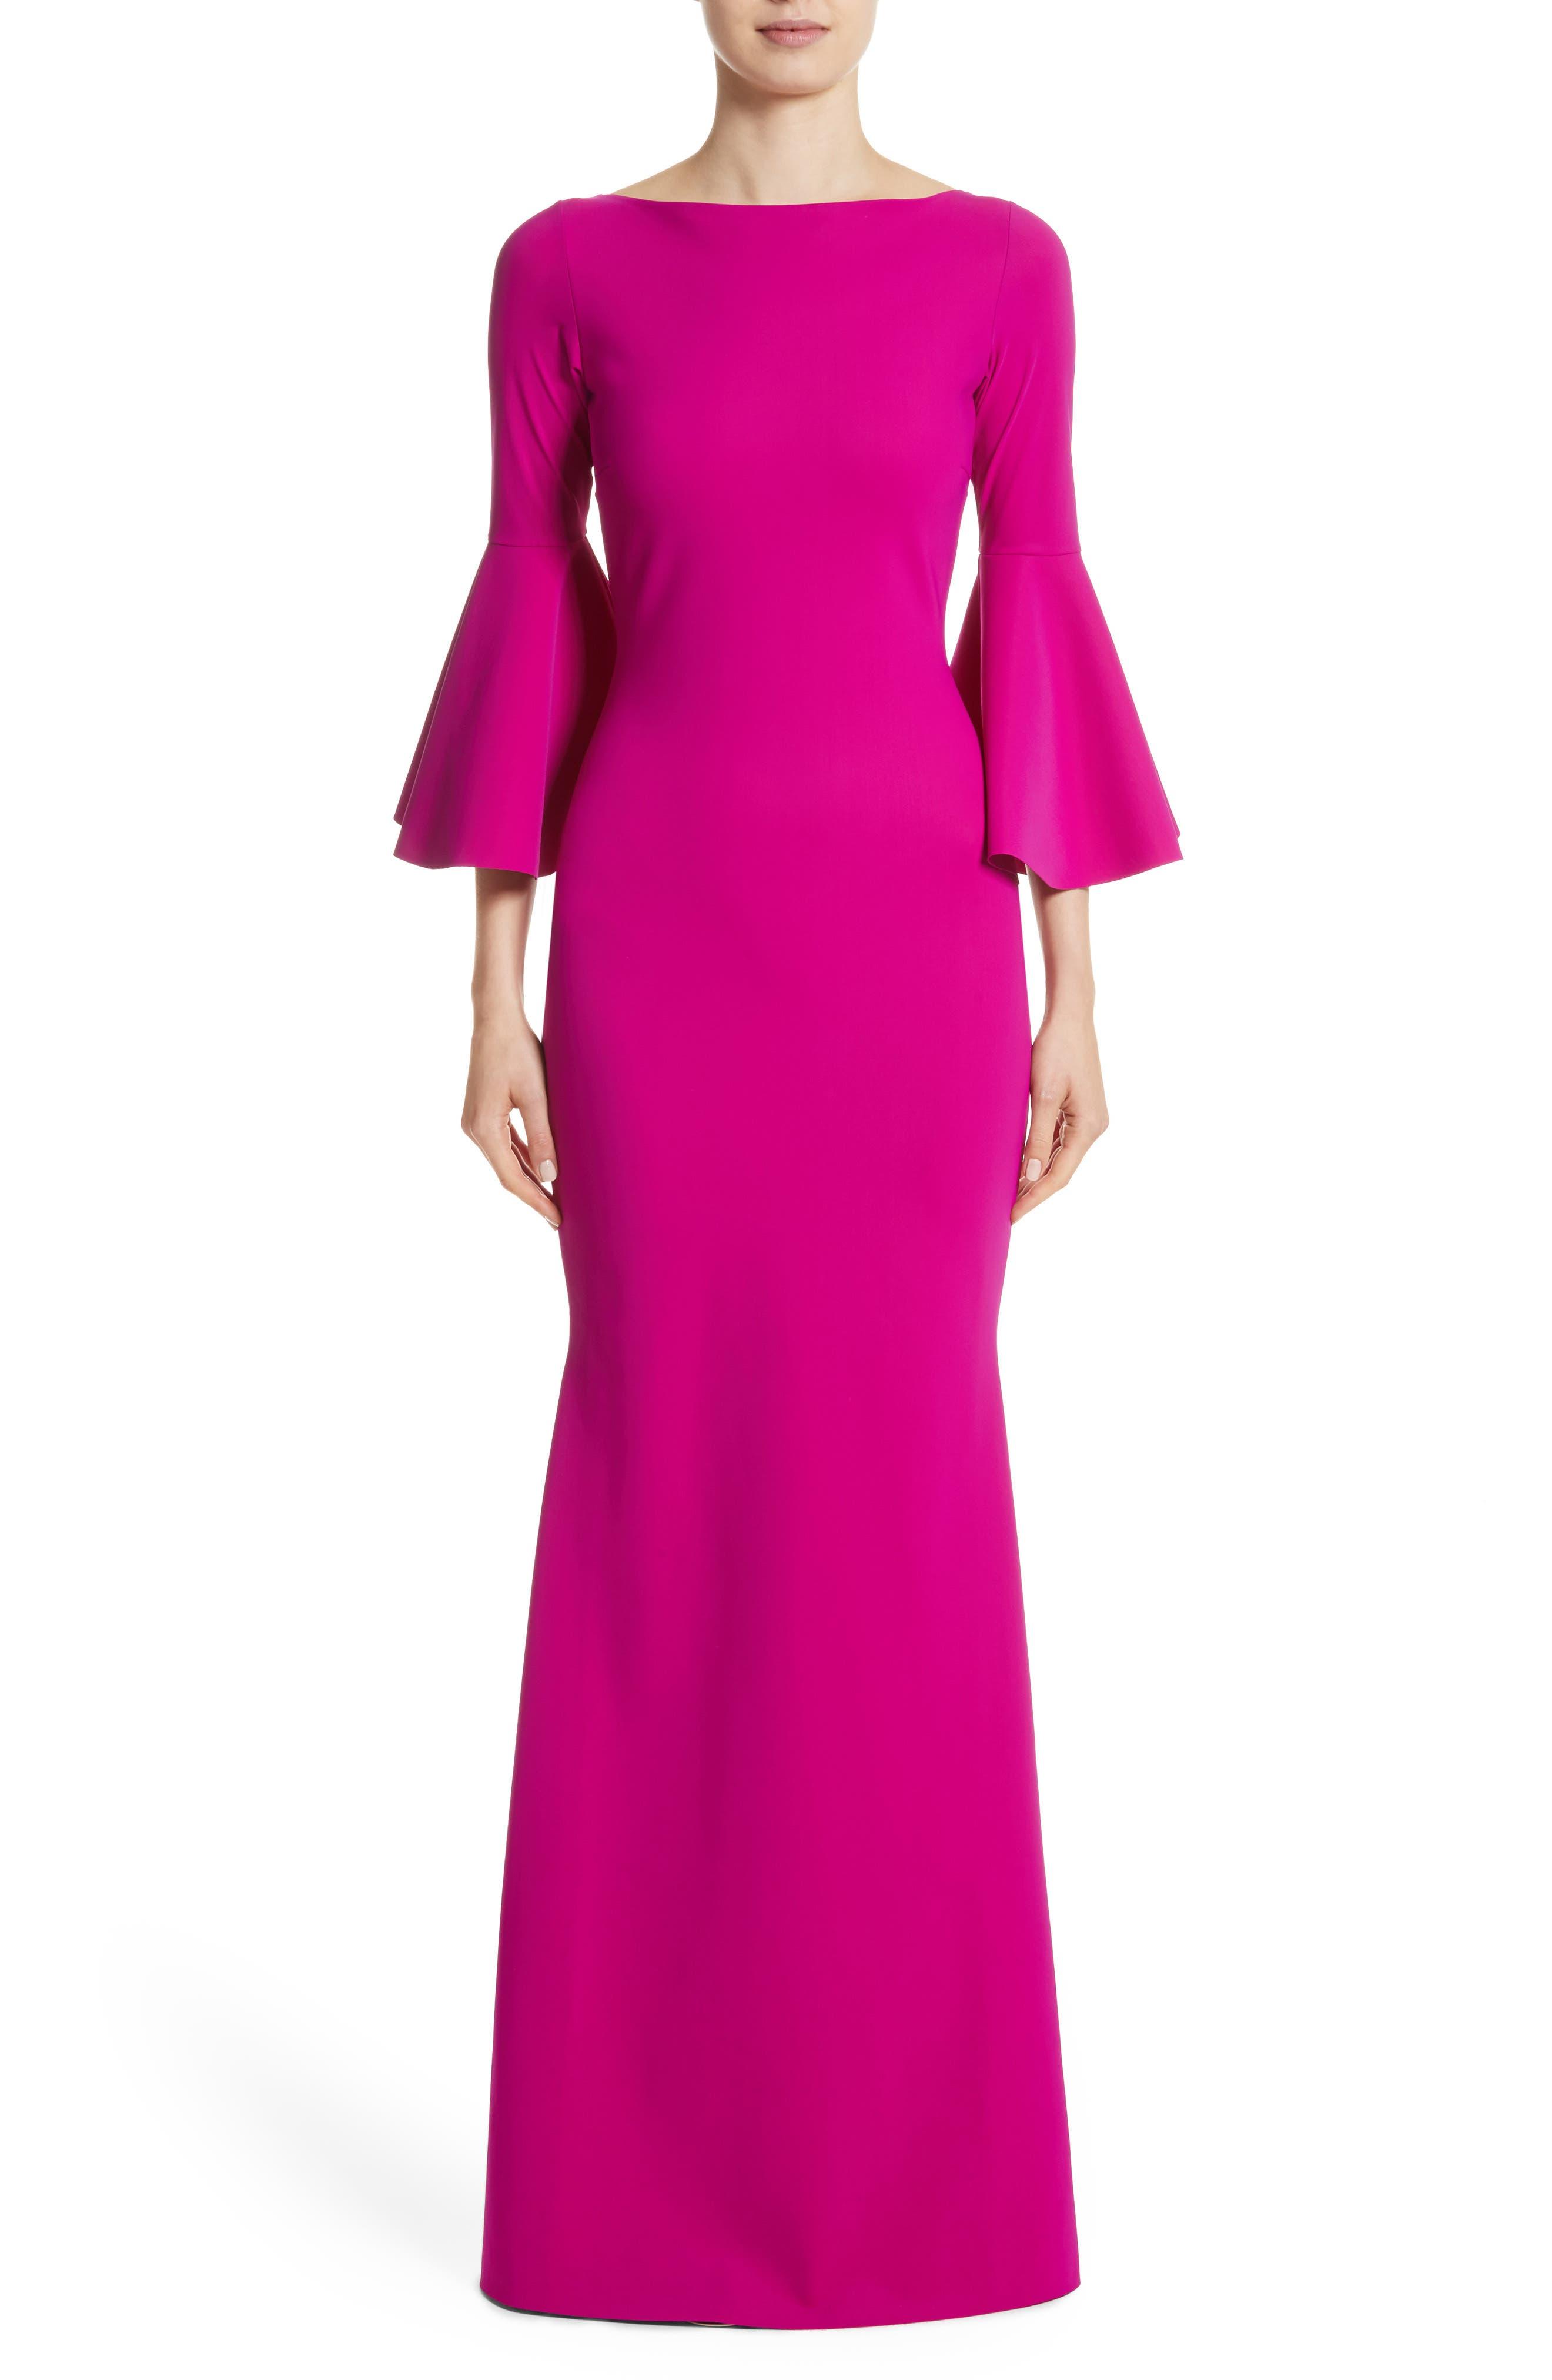 Chiara Boni La Petite Robe Iva Bell Sleeve Gown